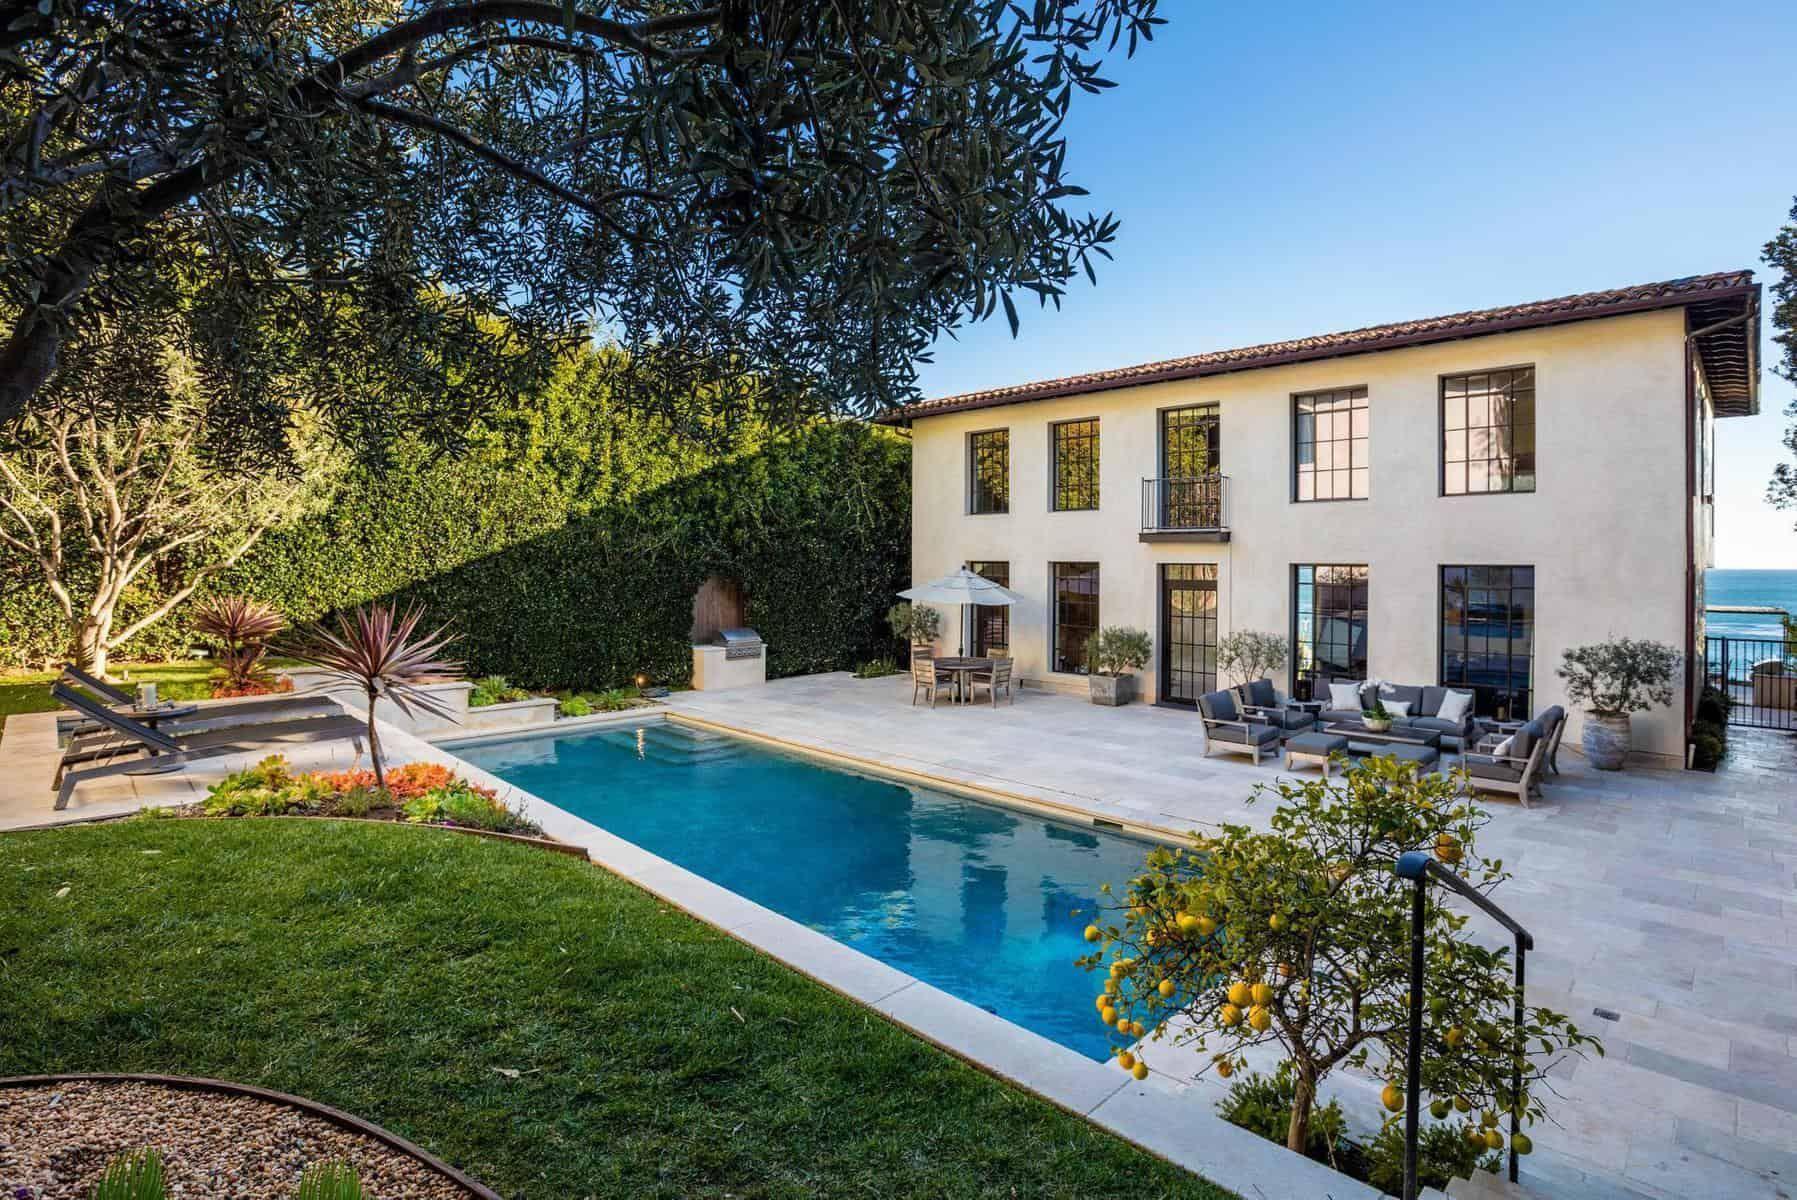 Aaron Rodgers And Danica Patrick Just Bought This 28 Million Malibu Mansion In 2020 Malibu Mansion Malibu Homes Malibu Beach House